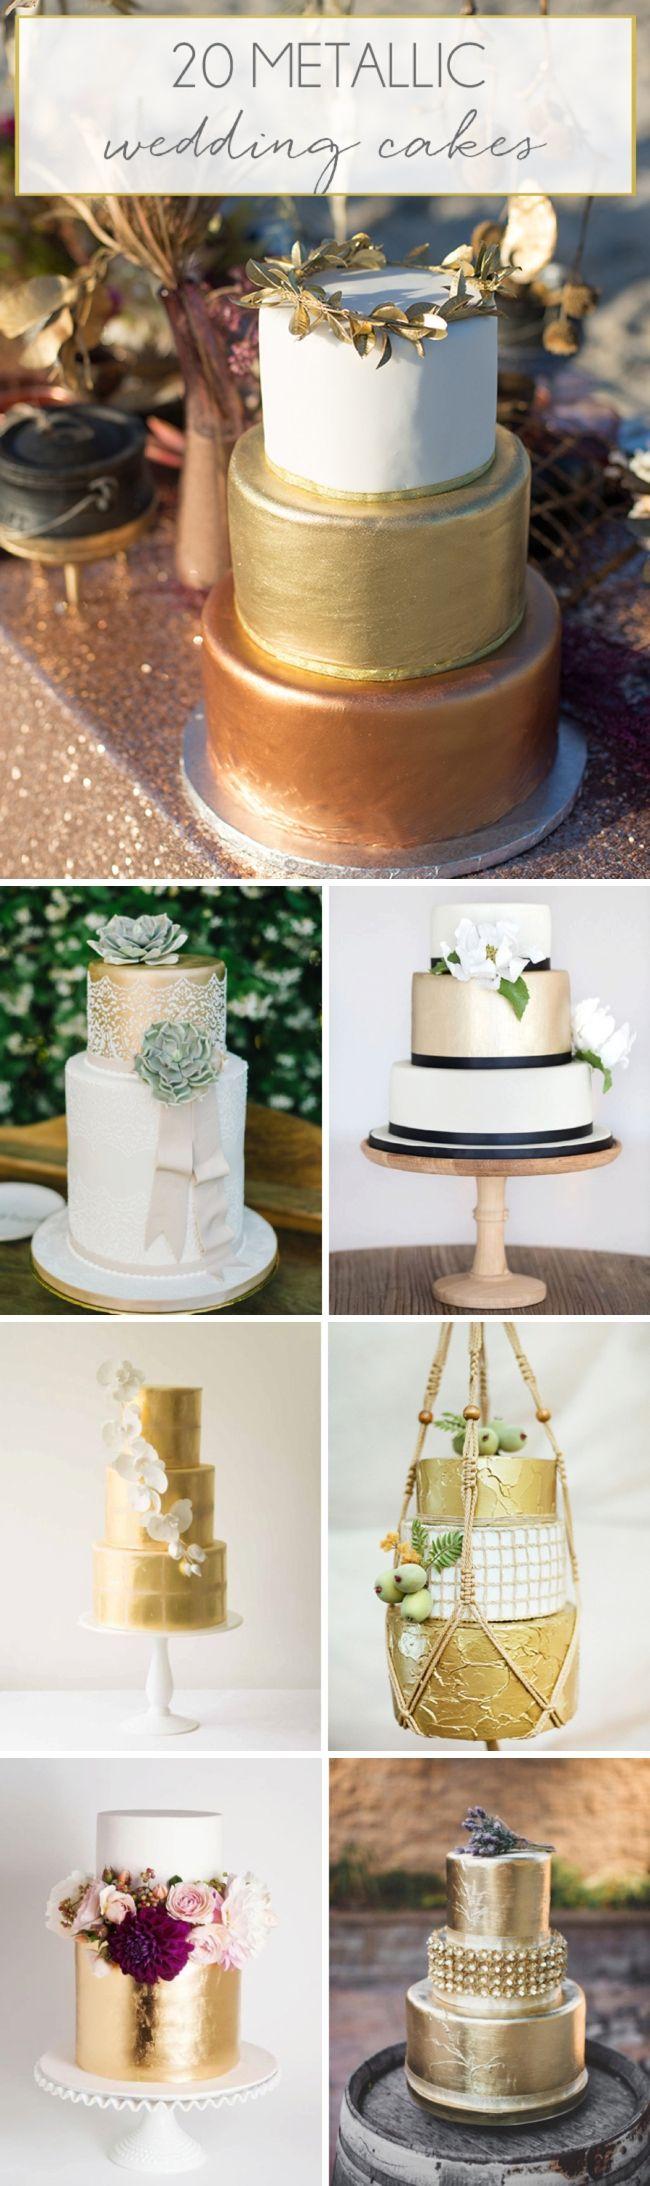 20 Metallic Wedding Cakes | SouthBound Bride | http://www.southboundbride.com/20-more-metallic-wedding-cakes